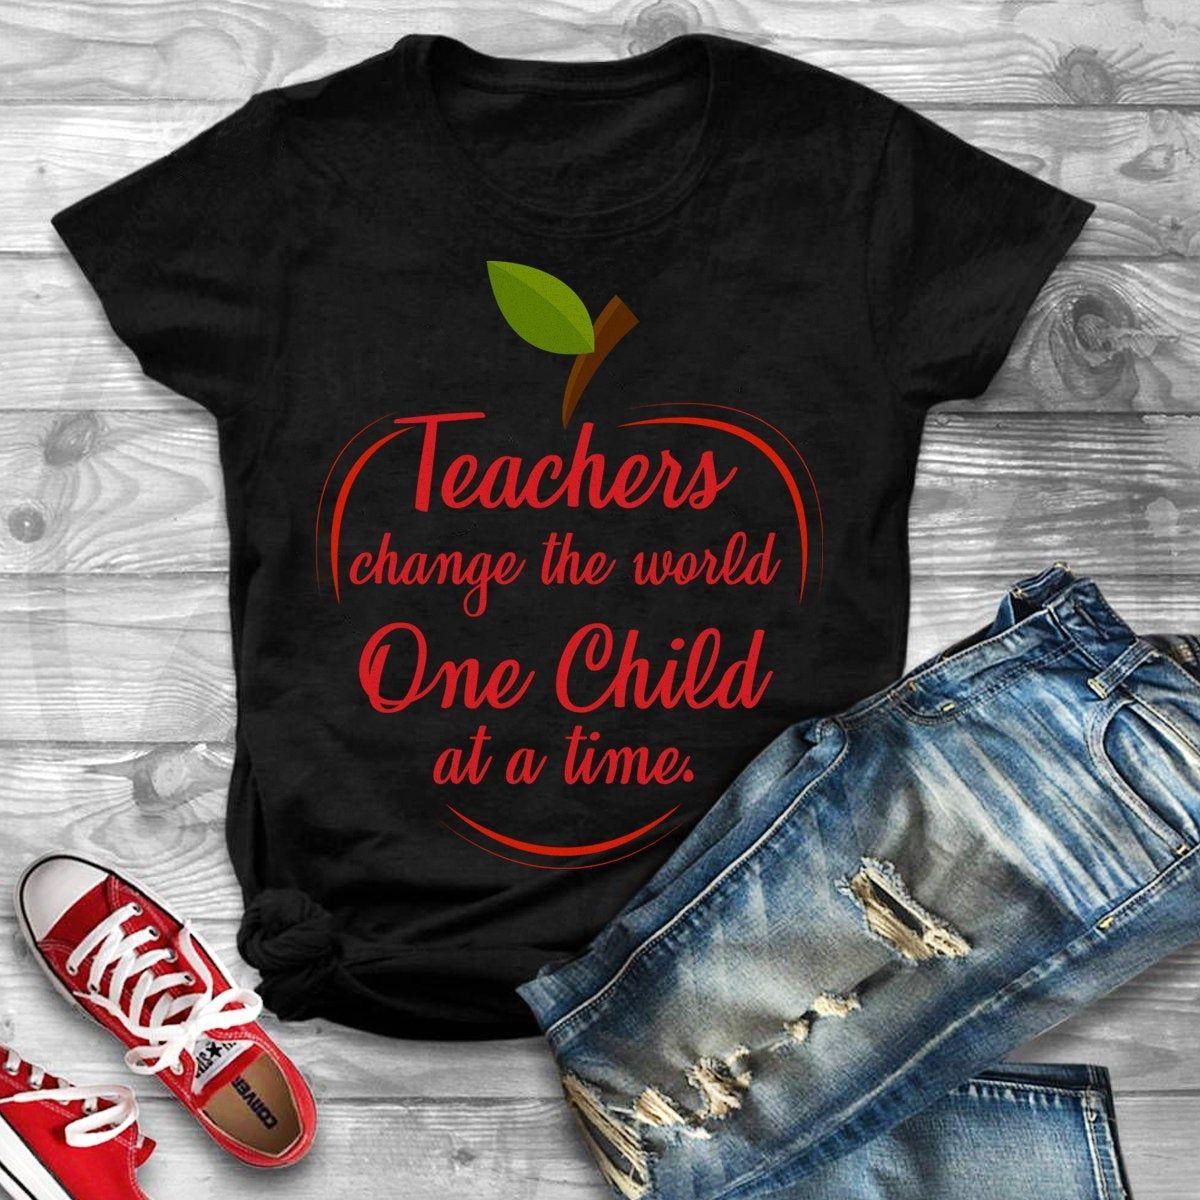 Change world teacher shirtteacher giftteacher etsy in